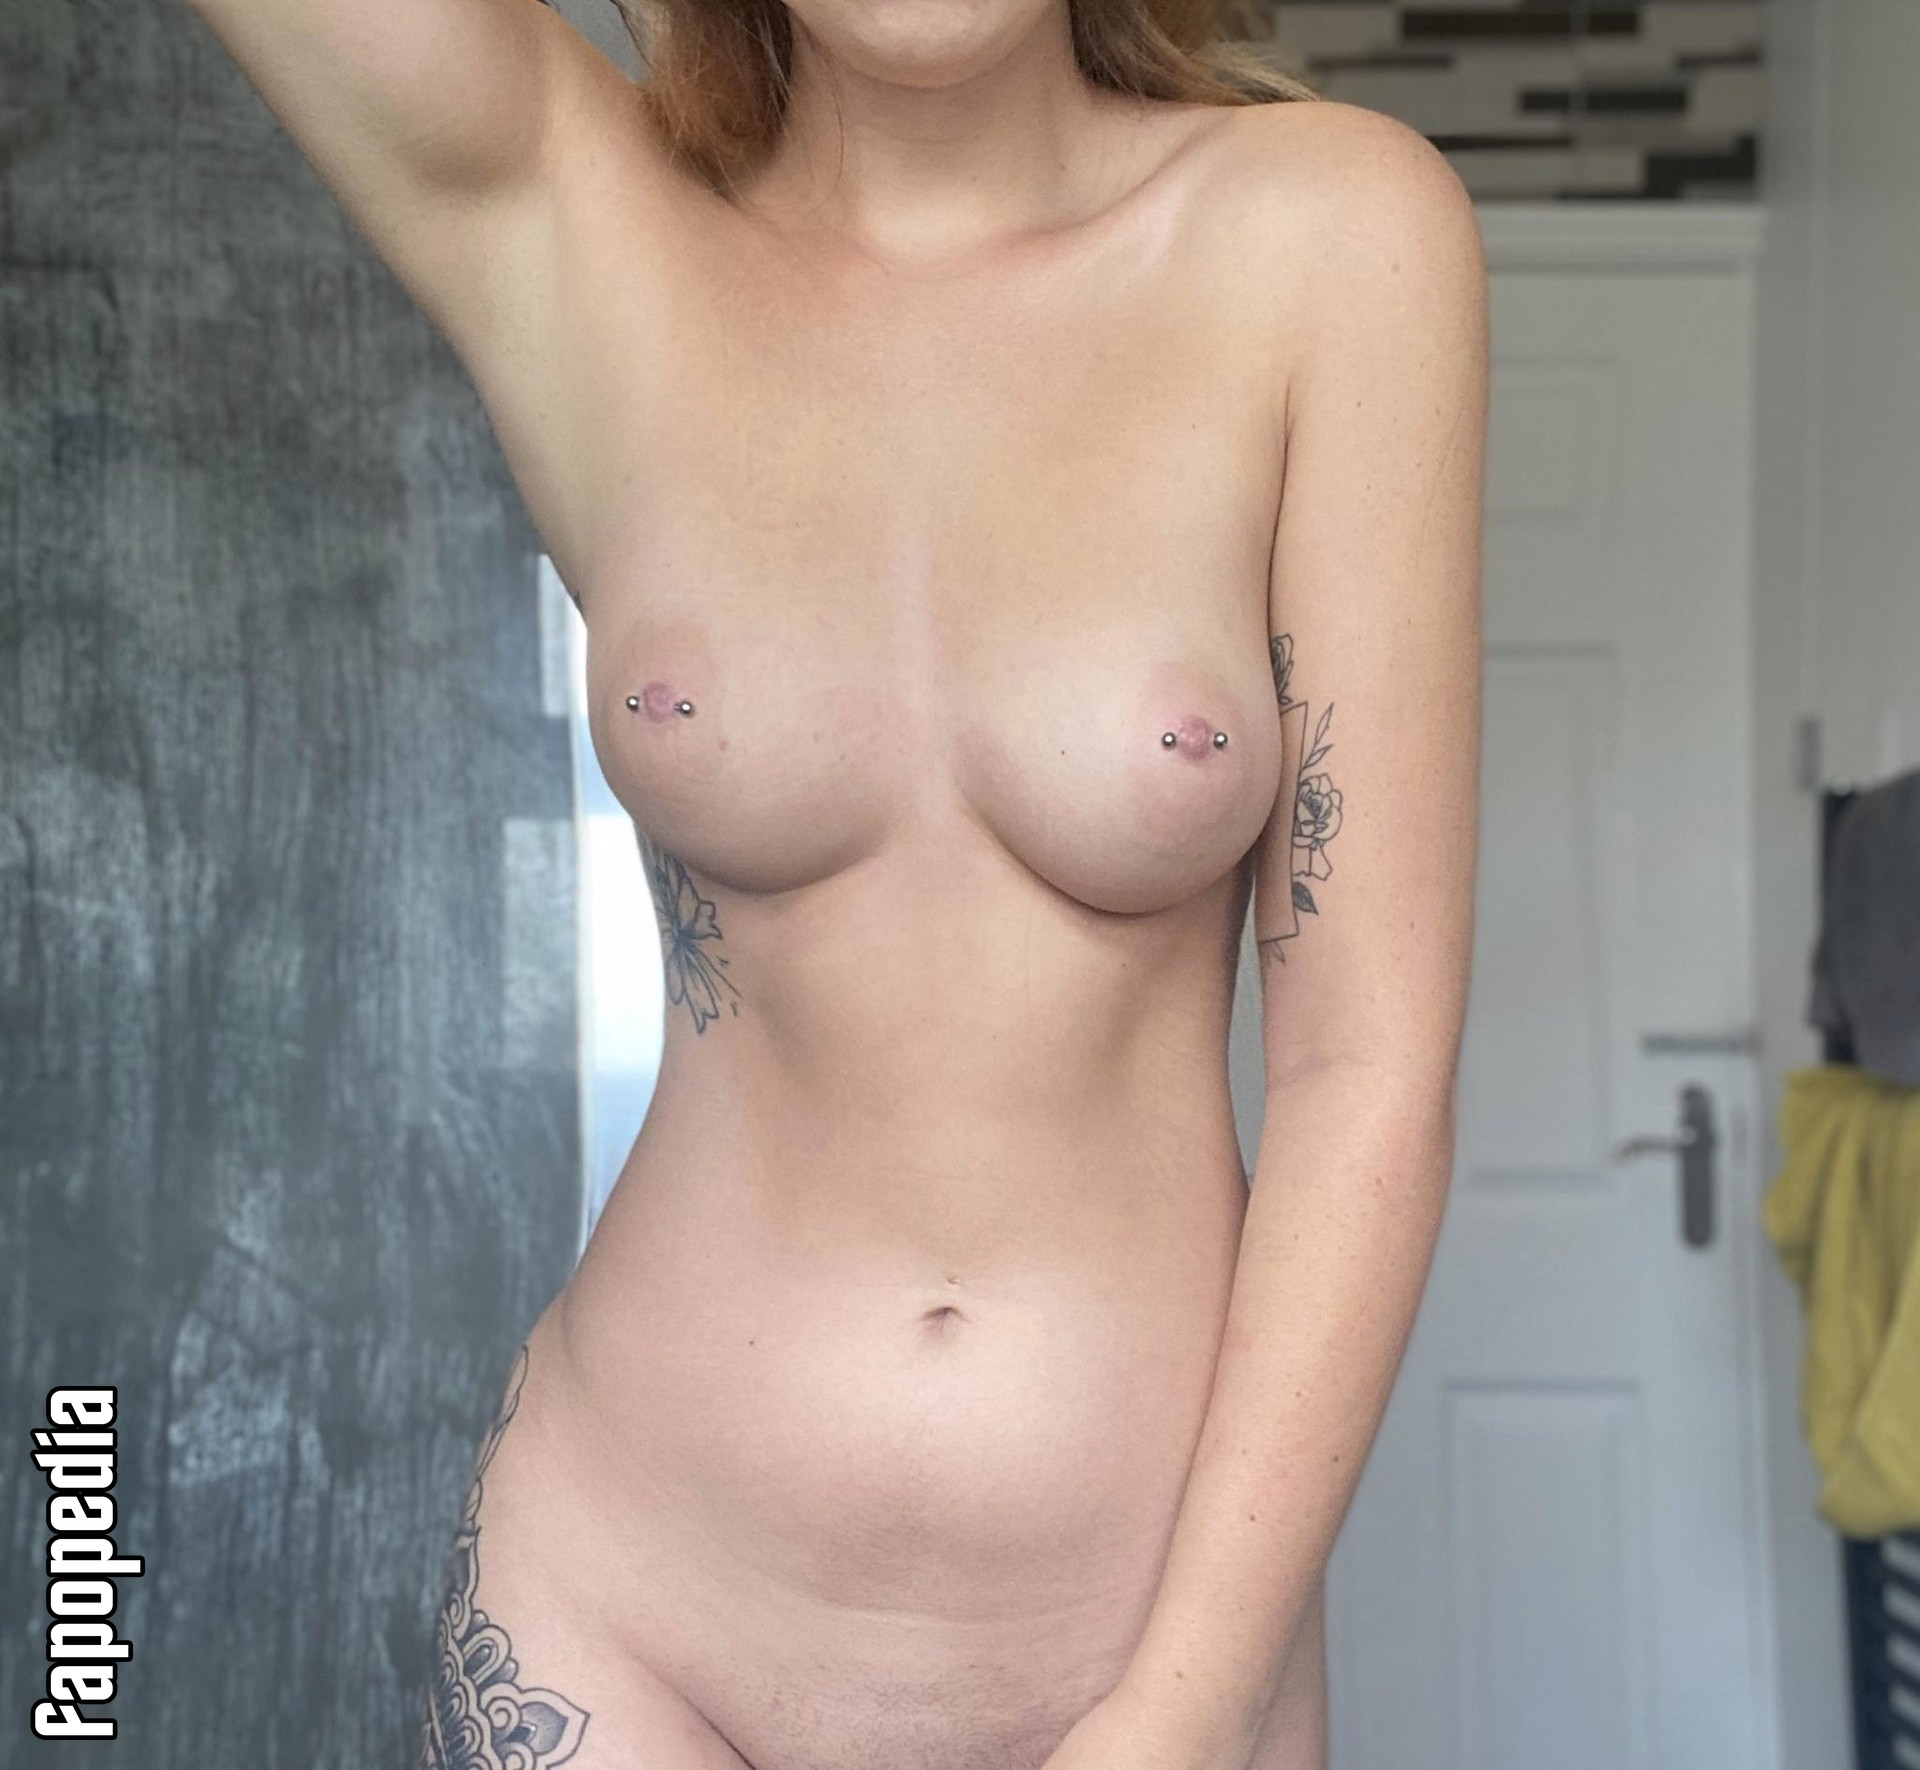 Rosexsammie Nude Leaks